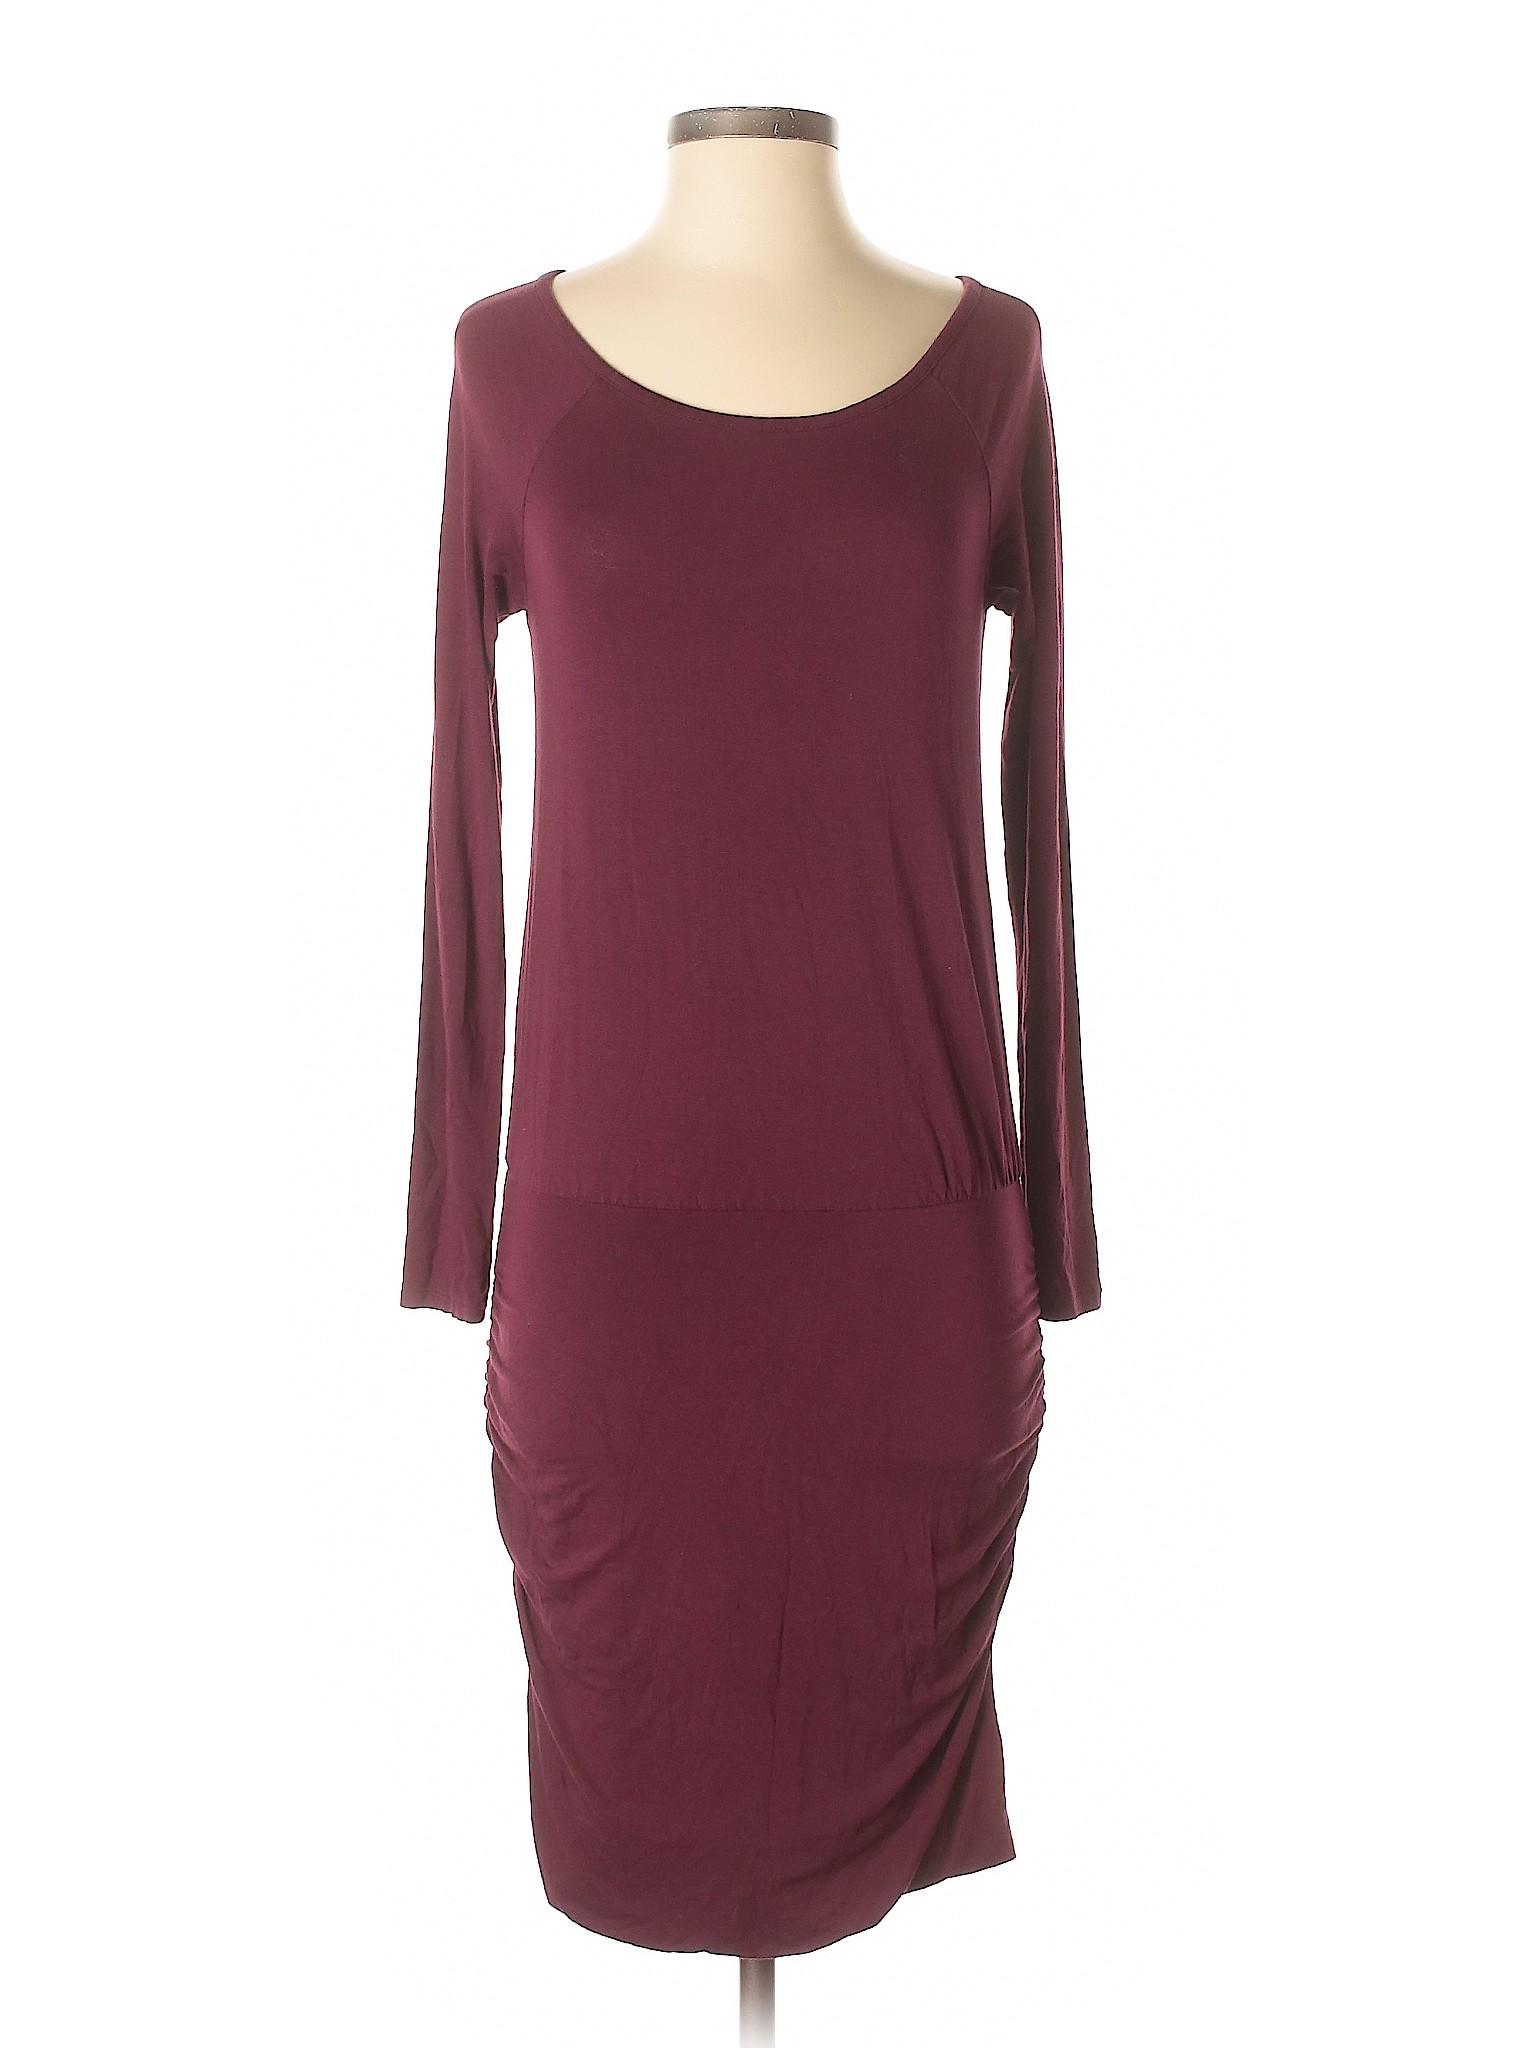 Selling Casual Dress Store Banana Republic Factory nWcqScrF